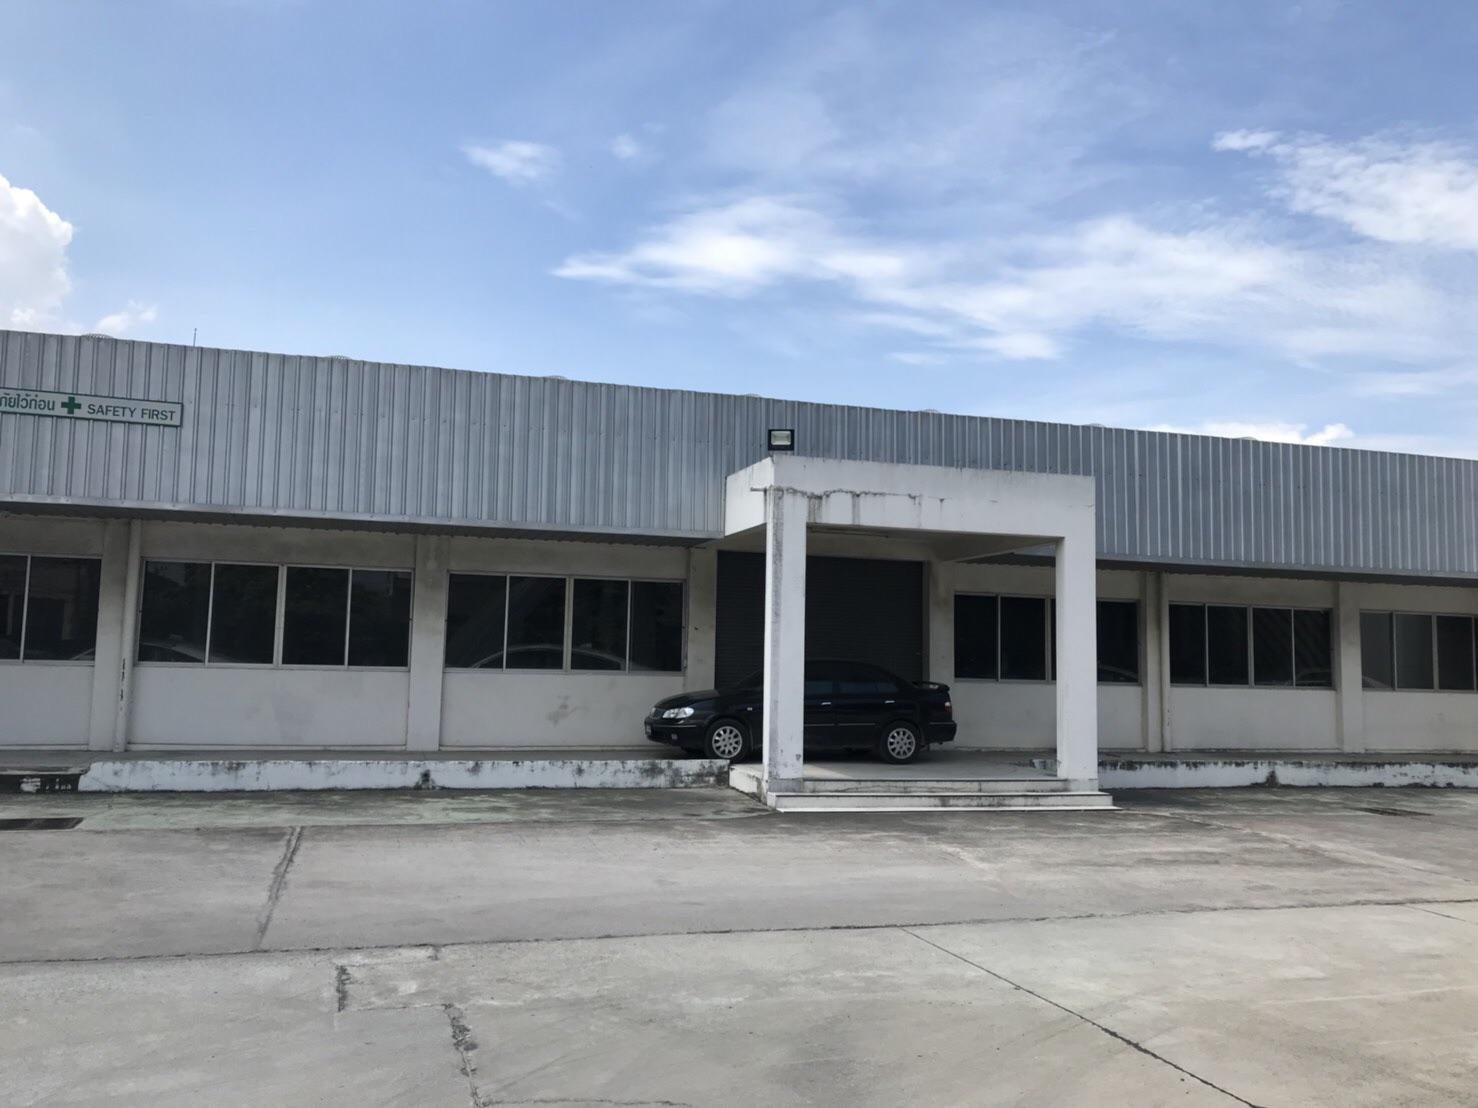 Factory for sale ในนิคมแหลมฉบัง (เขตส่งออก) อำเภอศรีราชา จังหวัดชลบุรี